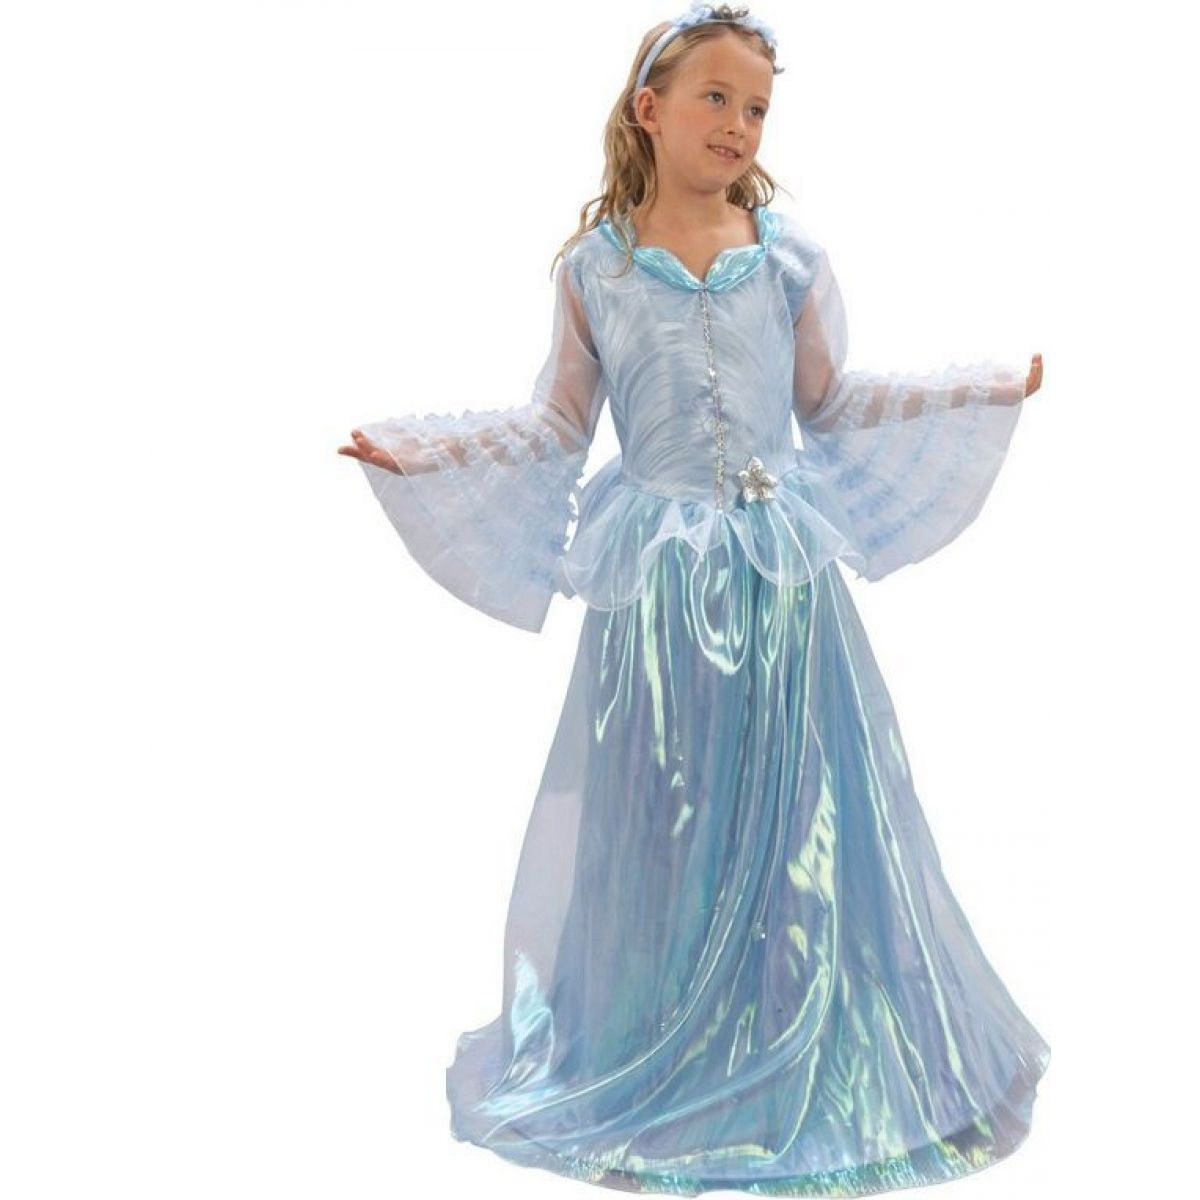 Made Dětský kostým Princezna Deluxe 130-140 cm